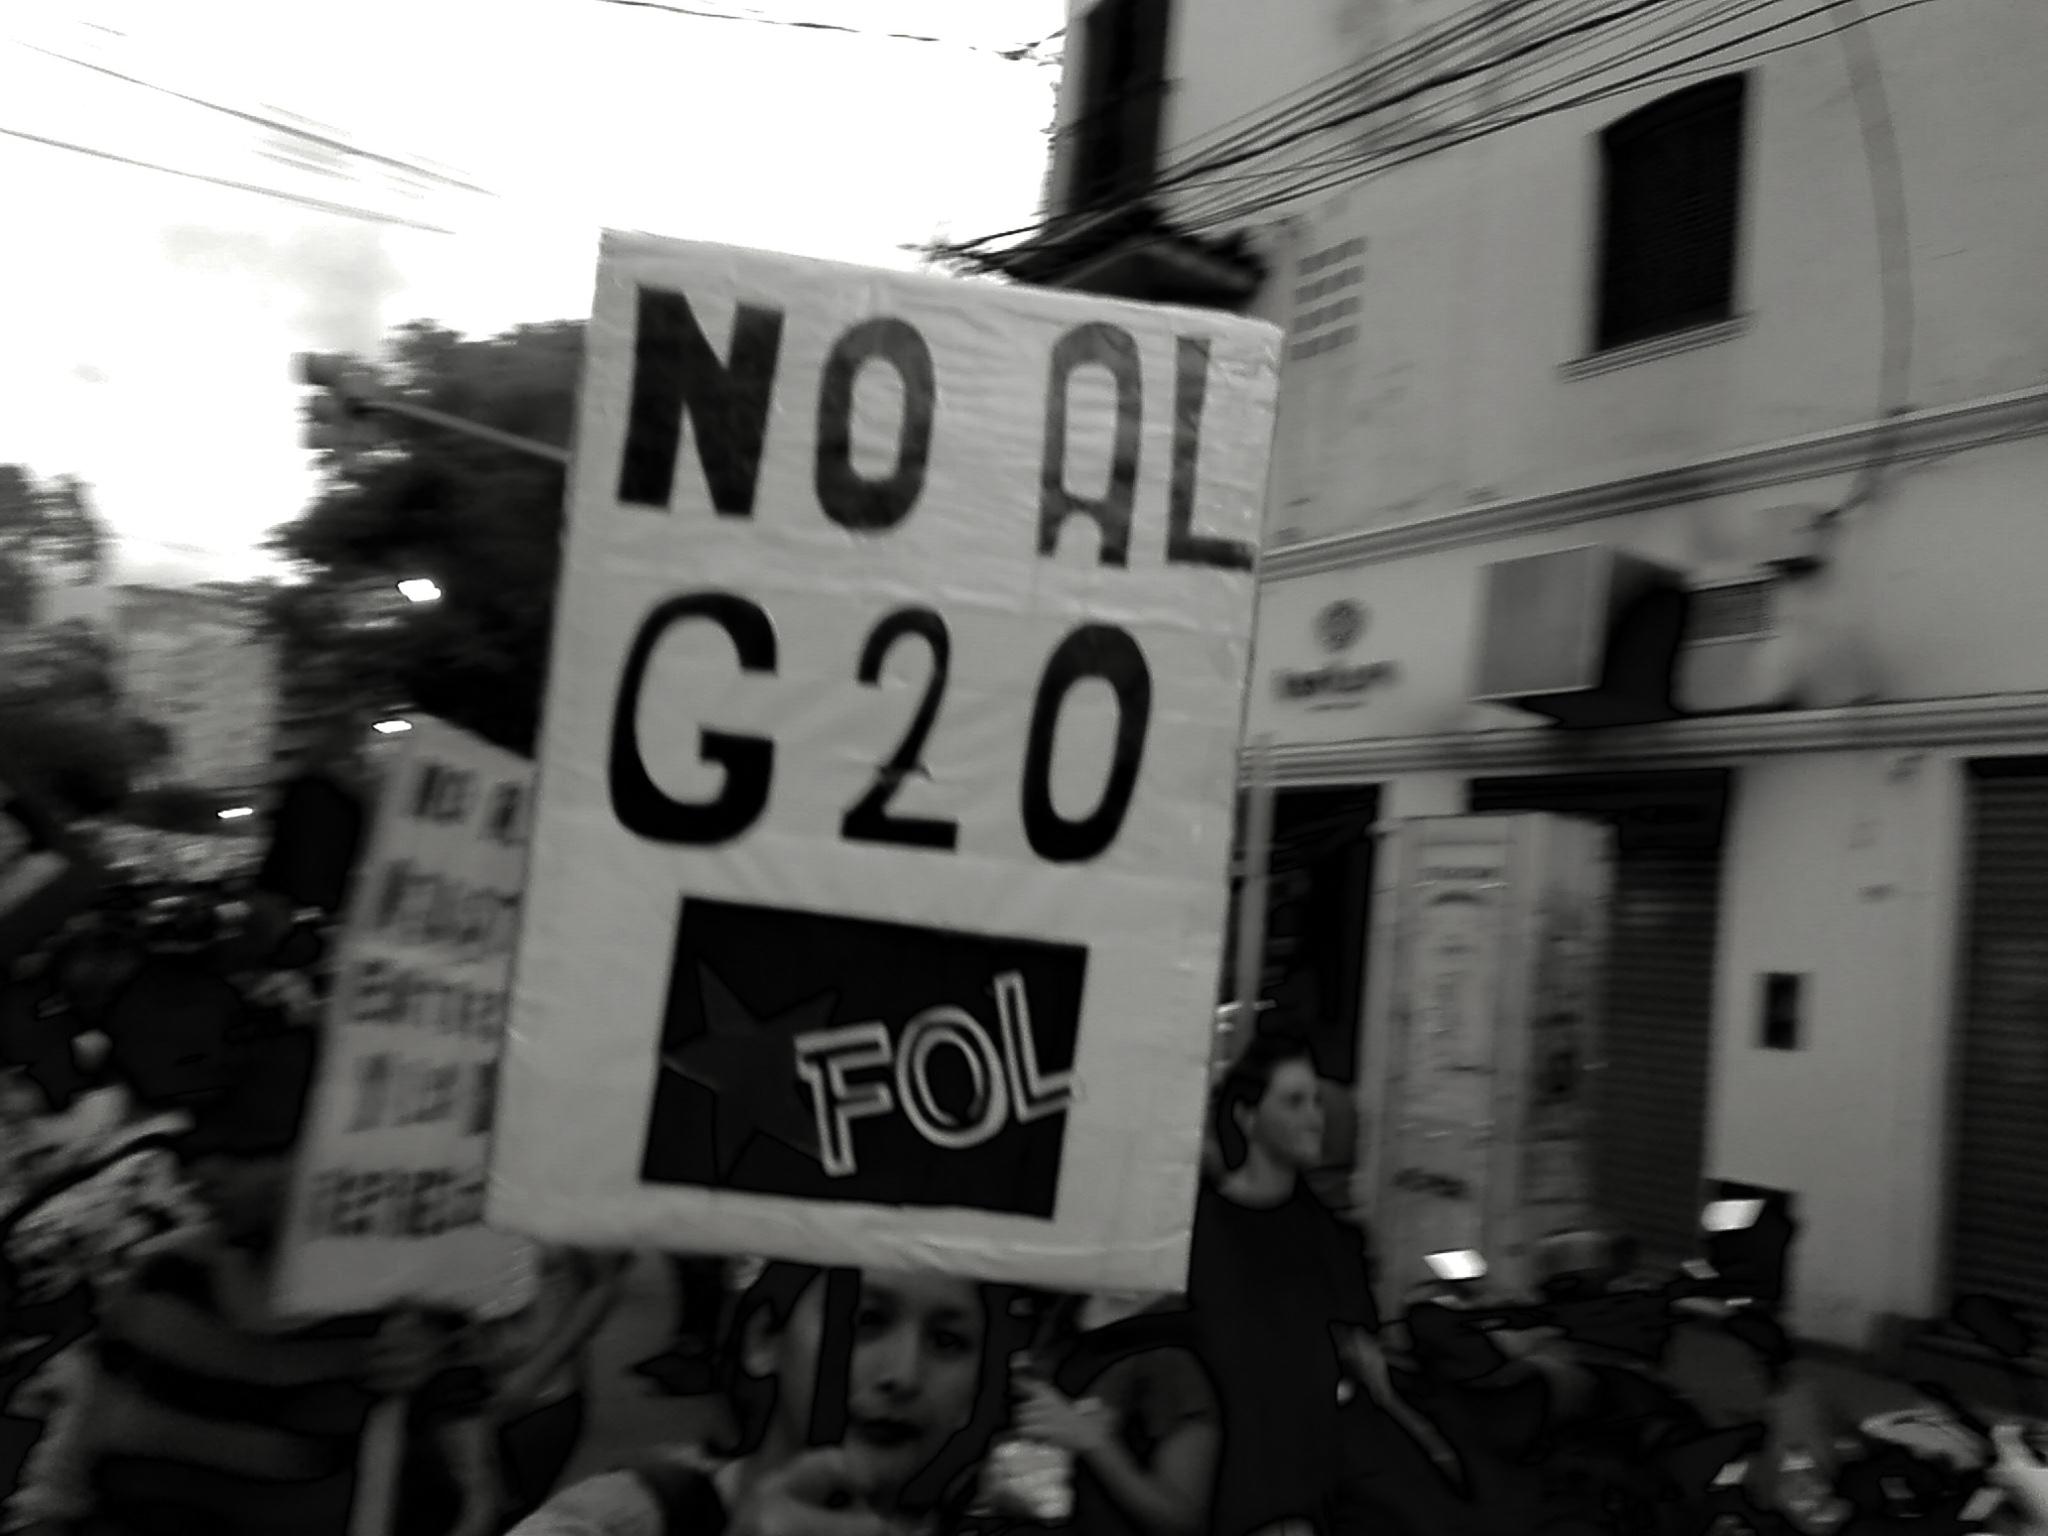 ContraG20 (14 de 20).jpg